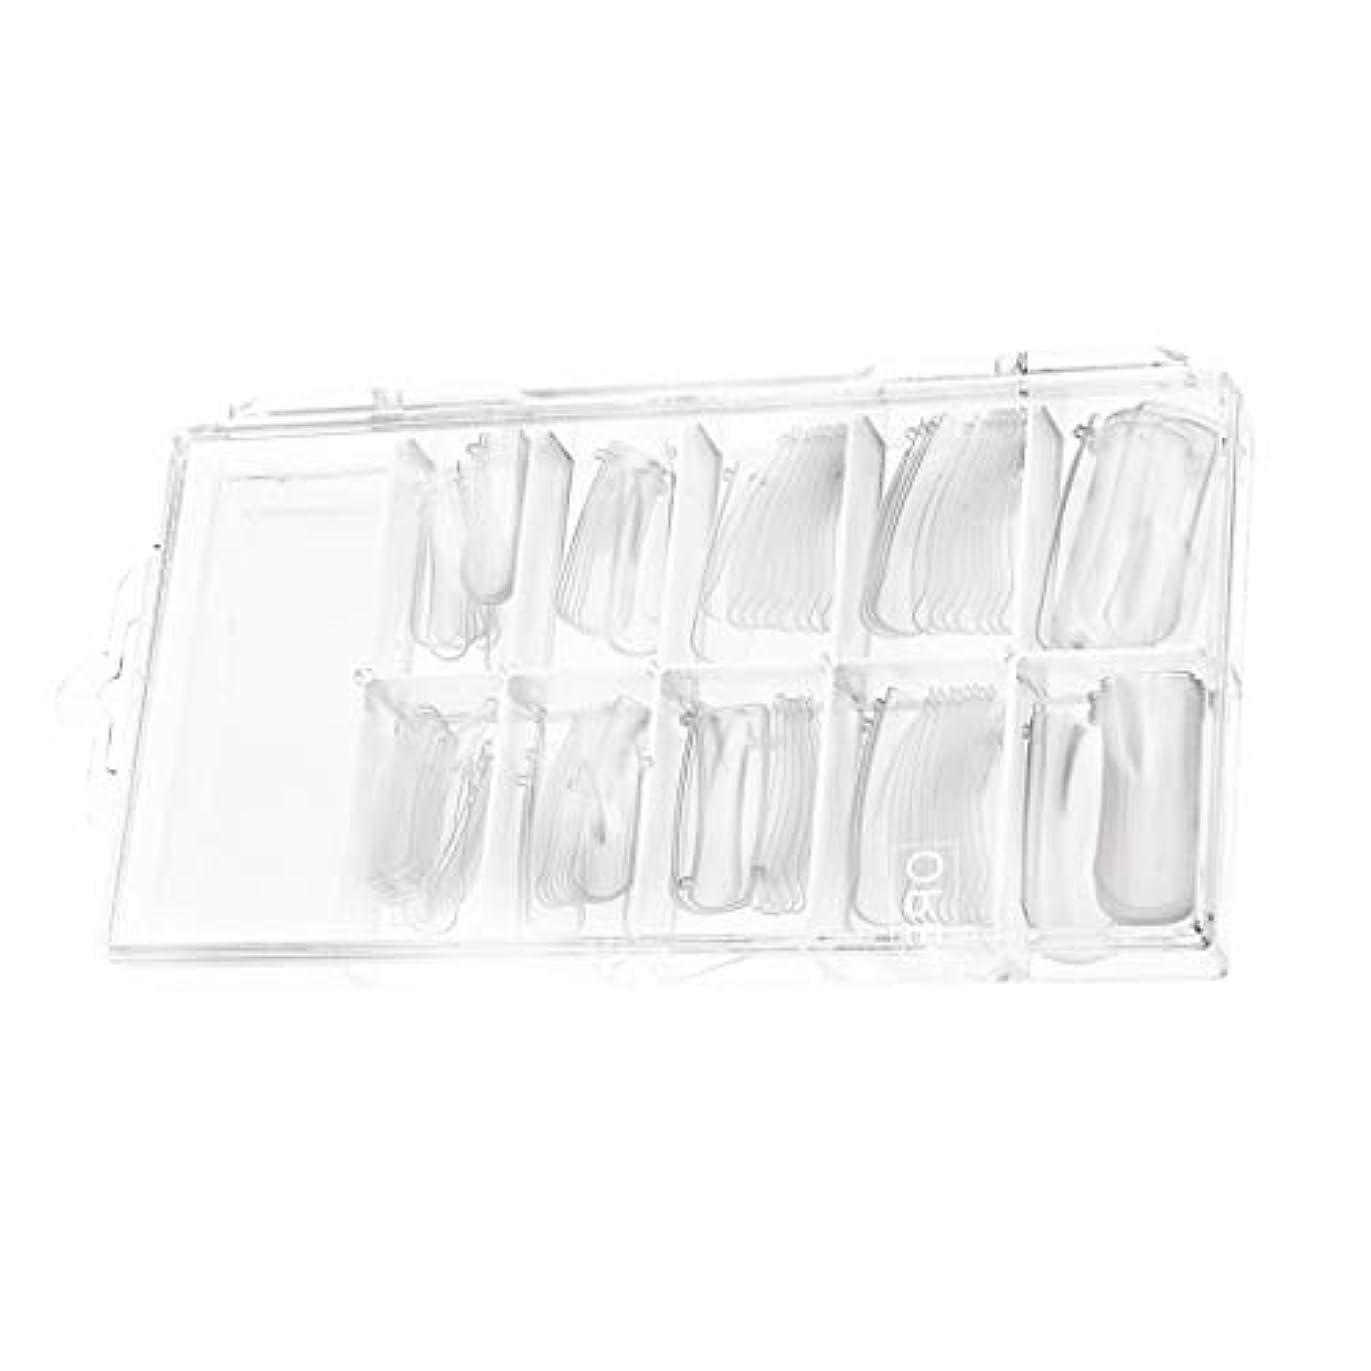 SM SunniMix 100個入り ネイルチップつけ爪 ネイル用品 ショート デコレーション 長い 無地 付け爪 練習用